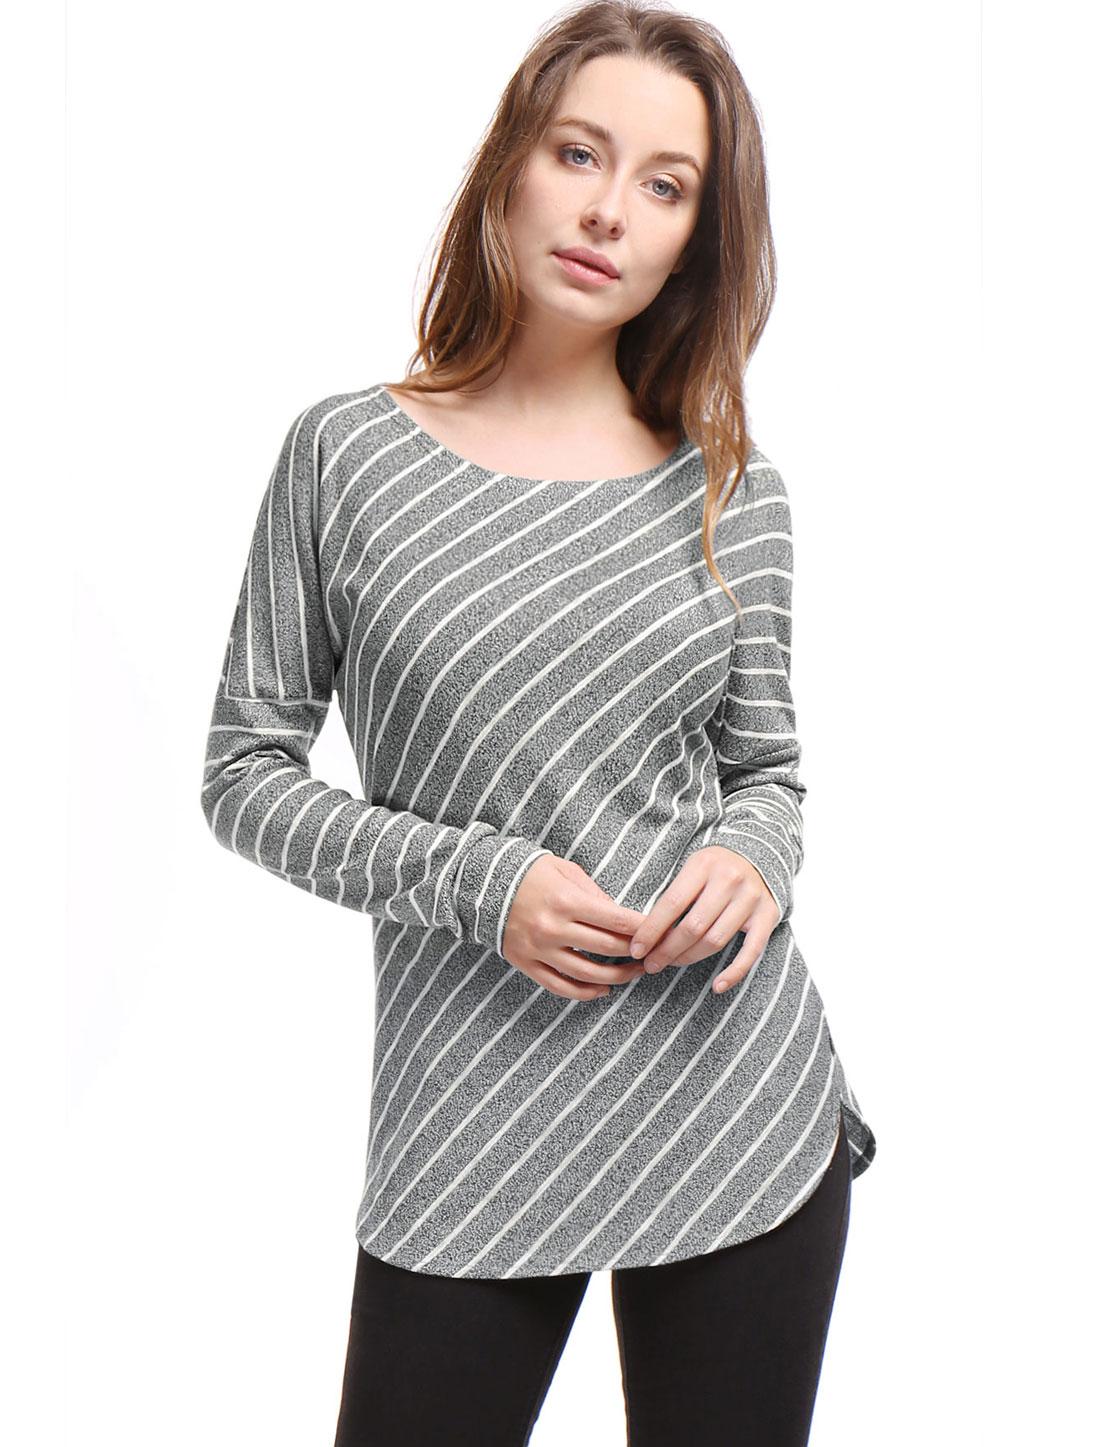 Women Stripes Scoop Neck Long Drop Sleeves Top Gray L